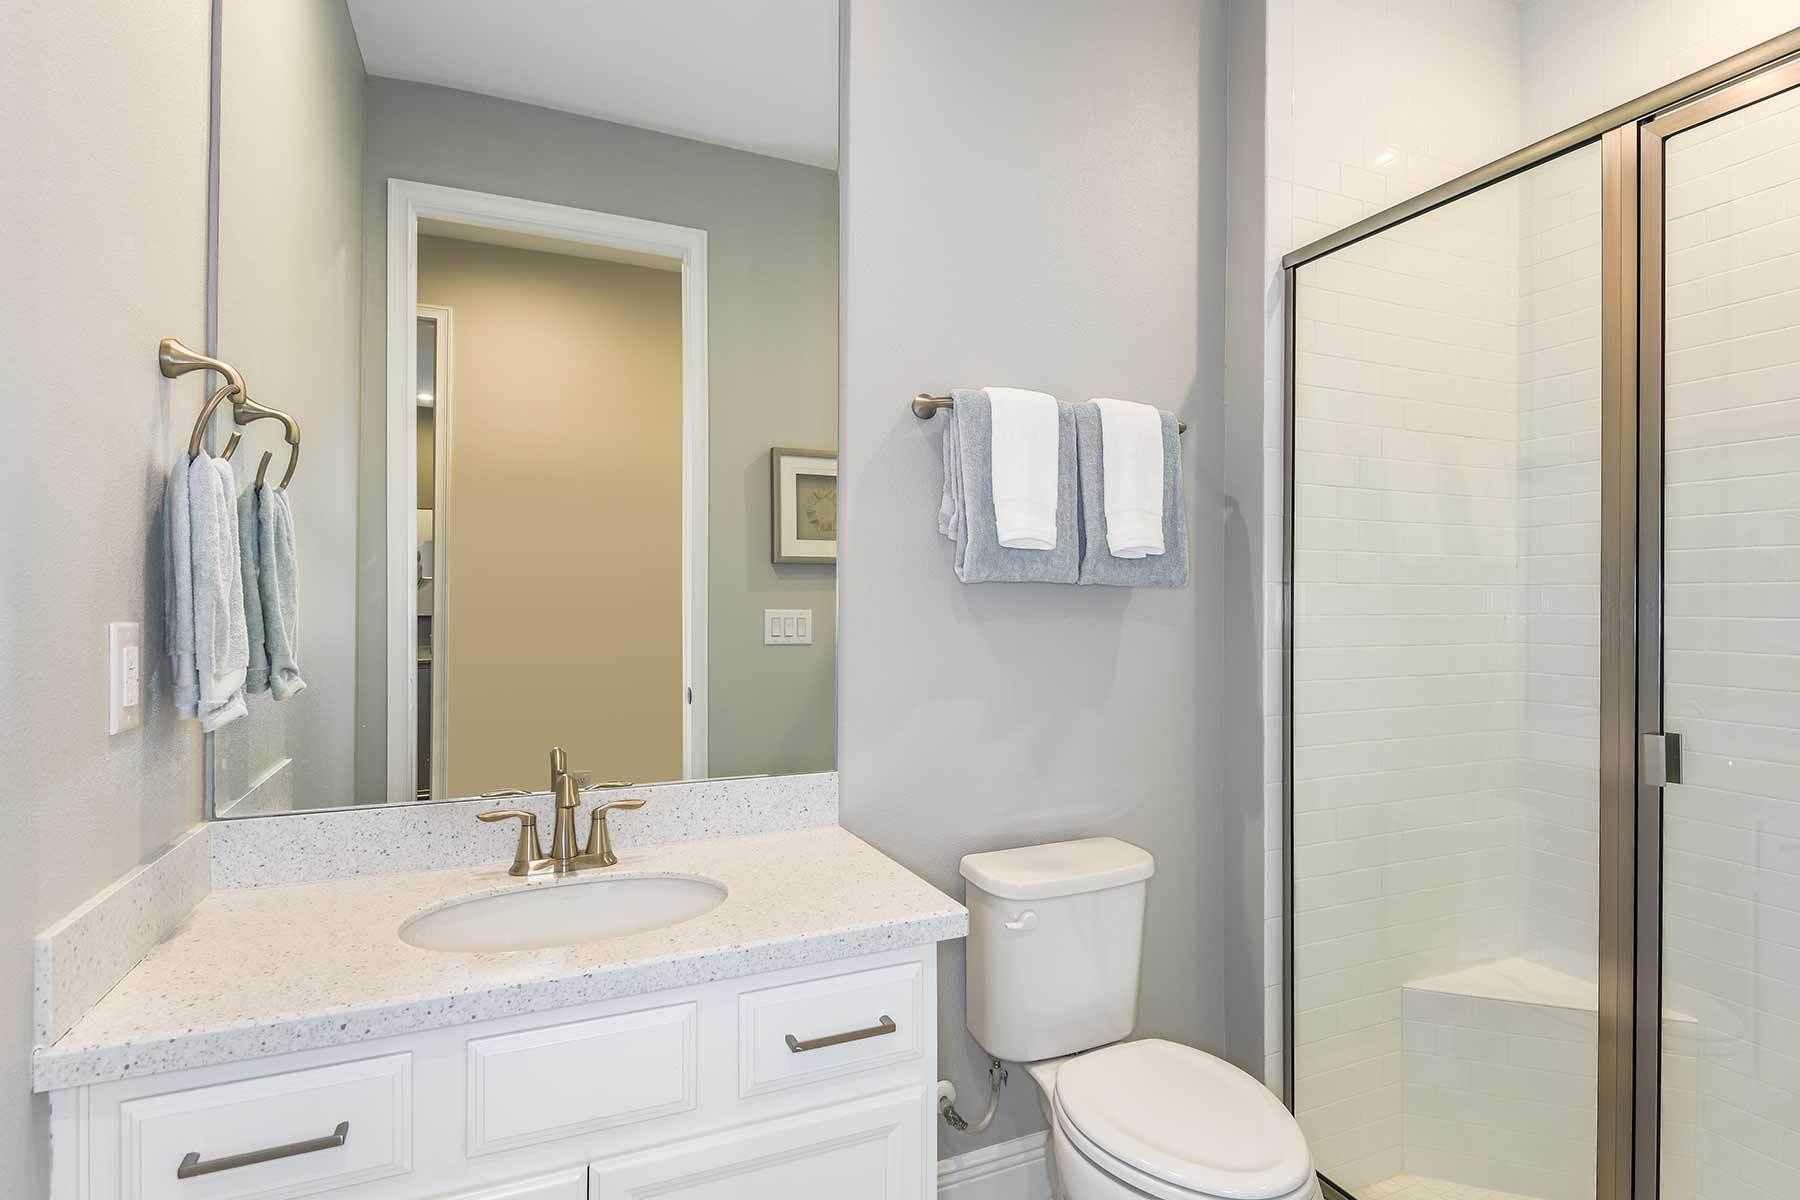 Bathroom featured in the Oceana By Mattamy Homes in Sarasota-Bradenton, FL